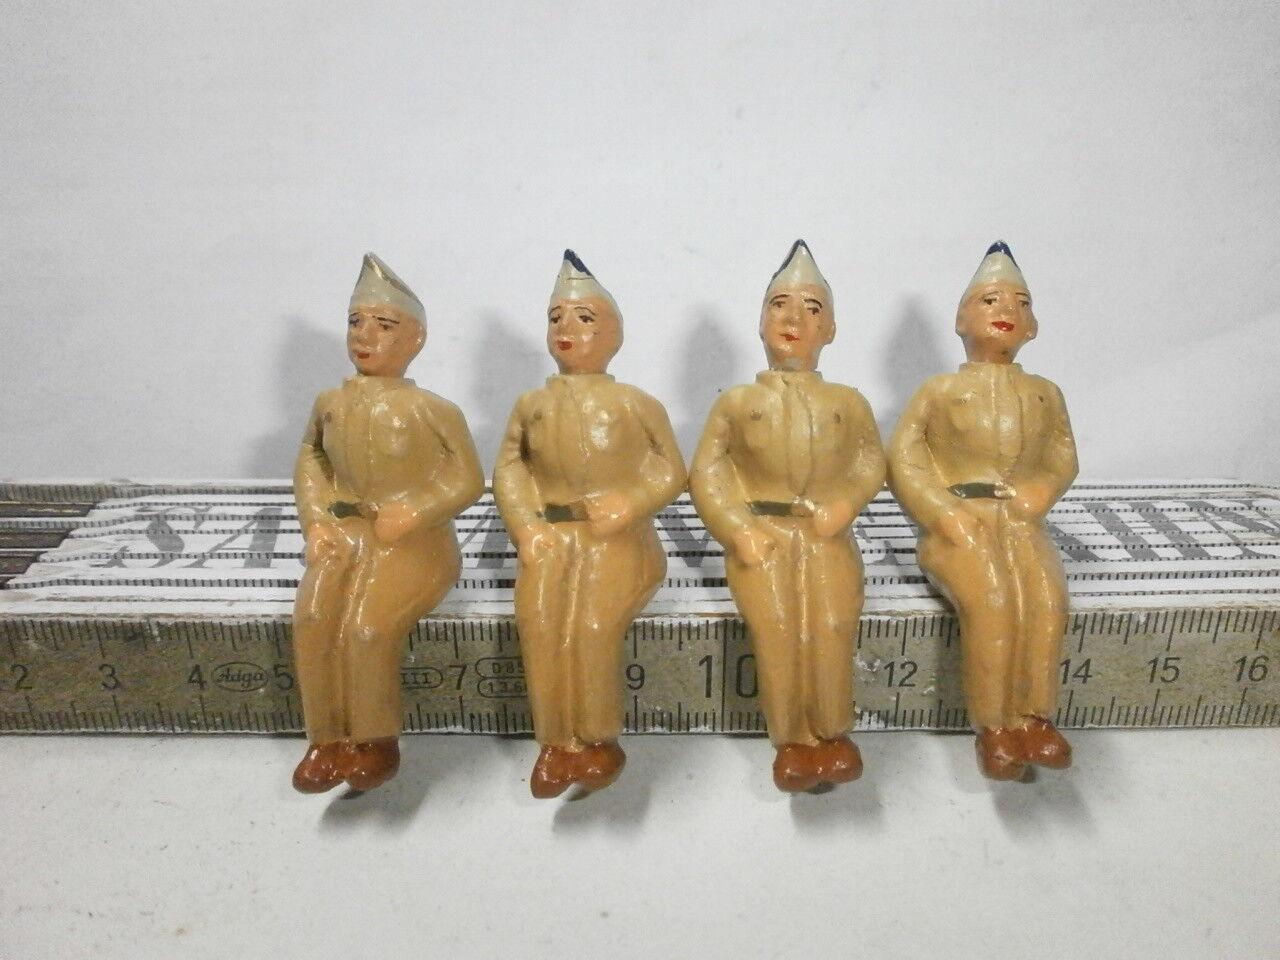 4 Sitzsoldaten Amerikaner for Elastolin Tippco Motor Vehicles Zu 7cm